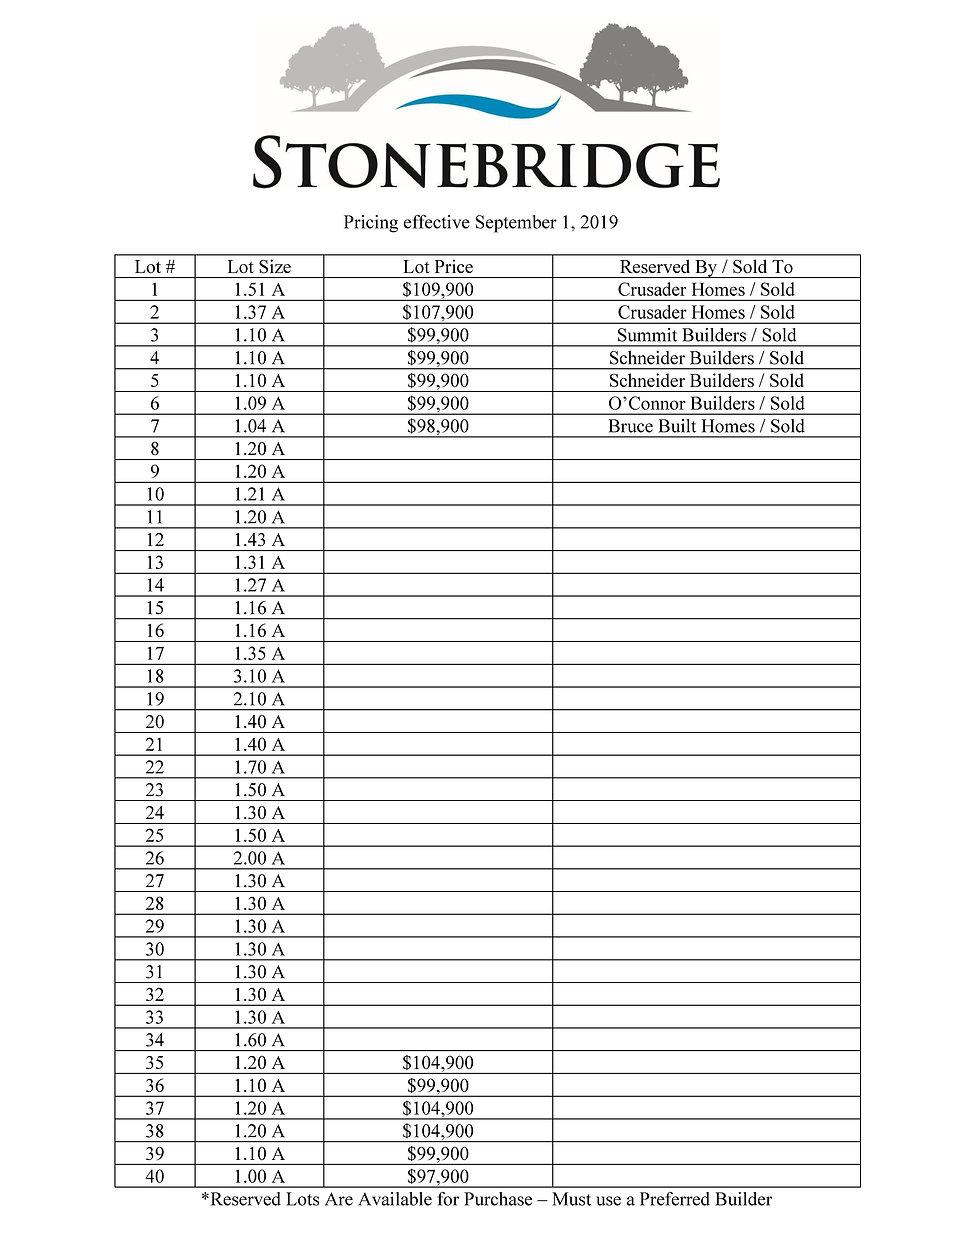 StonebridgePricingFinalPh1 11-19.jpg